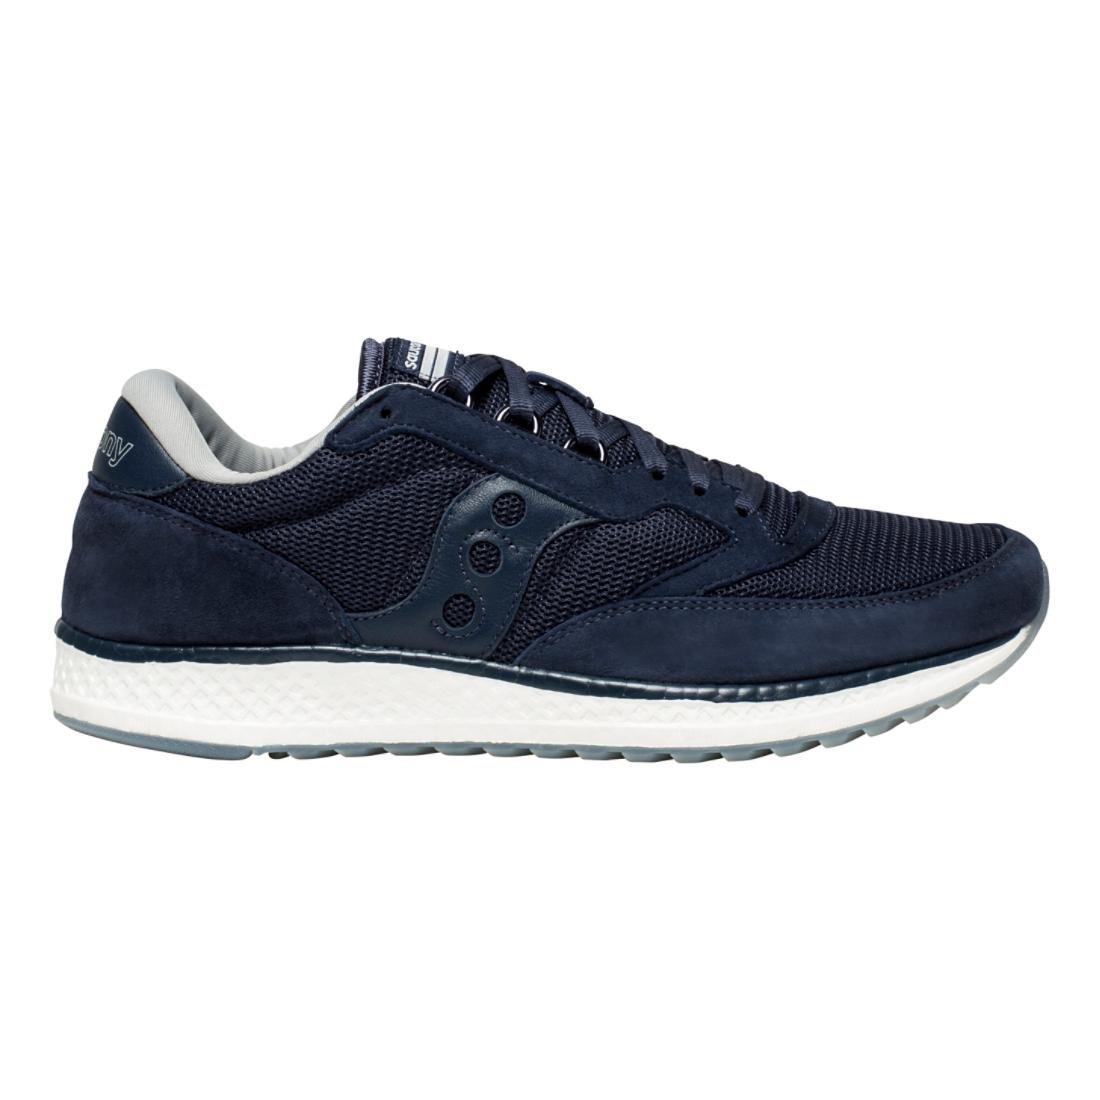 Saucony Originals Men's Freedom Runner Running Shoe B072N9LX2L 11 D(M) US|Navy